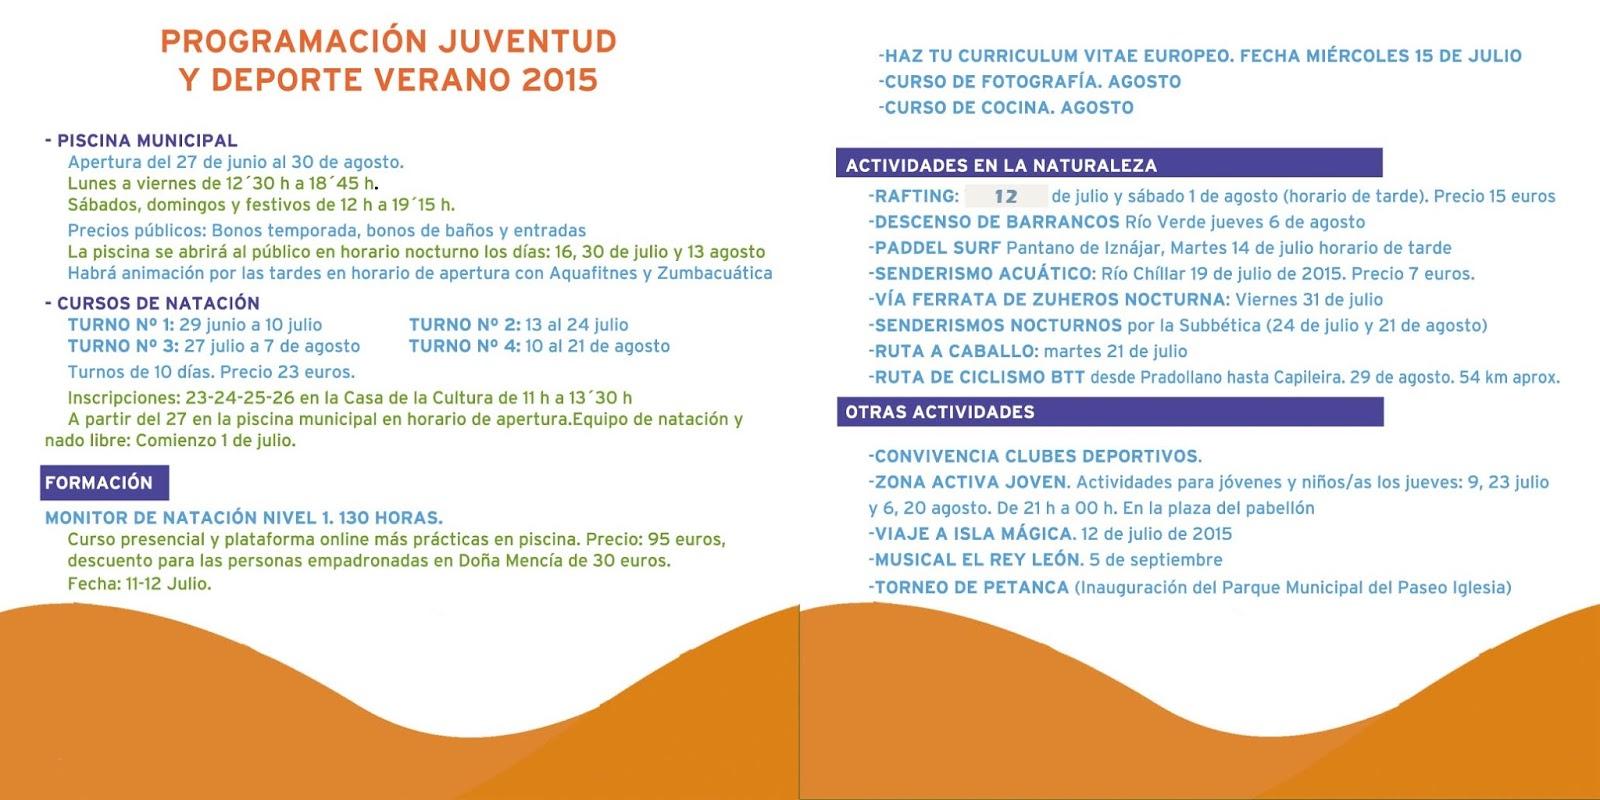 Programa actividades verano 2015 #veranodiferenteDM